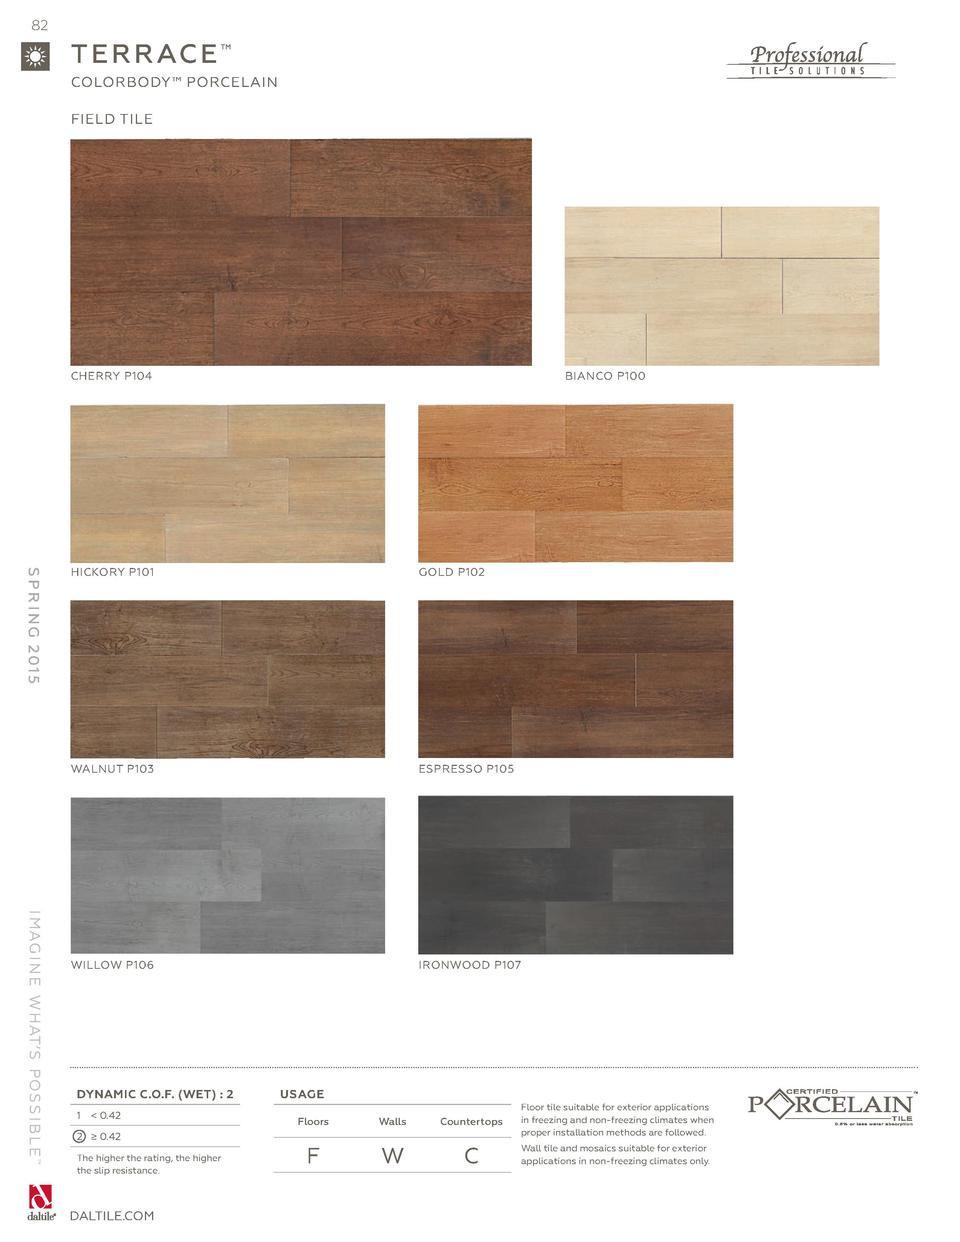 hardwood flooring el paso tx of daltile spring 2015 catalog simplebooklet com in 82 t e r r ac e colorbody porcelain field tile cherry p104 bianco p100 i mag i n e w hat